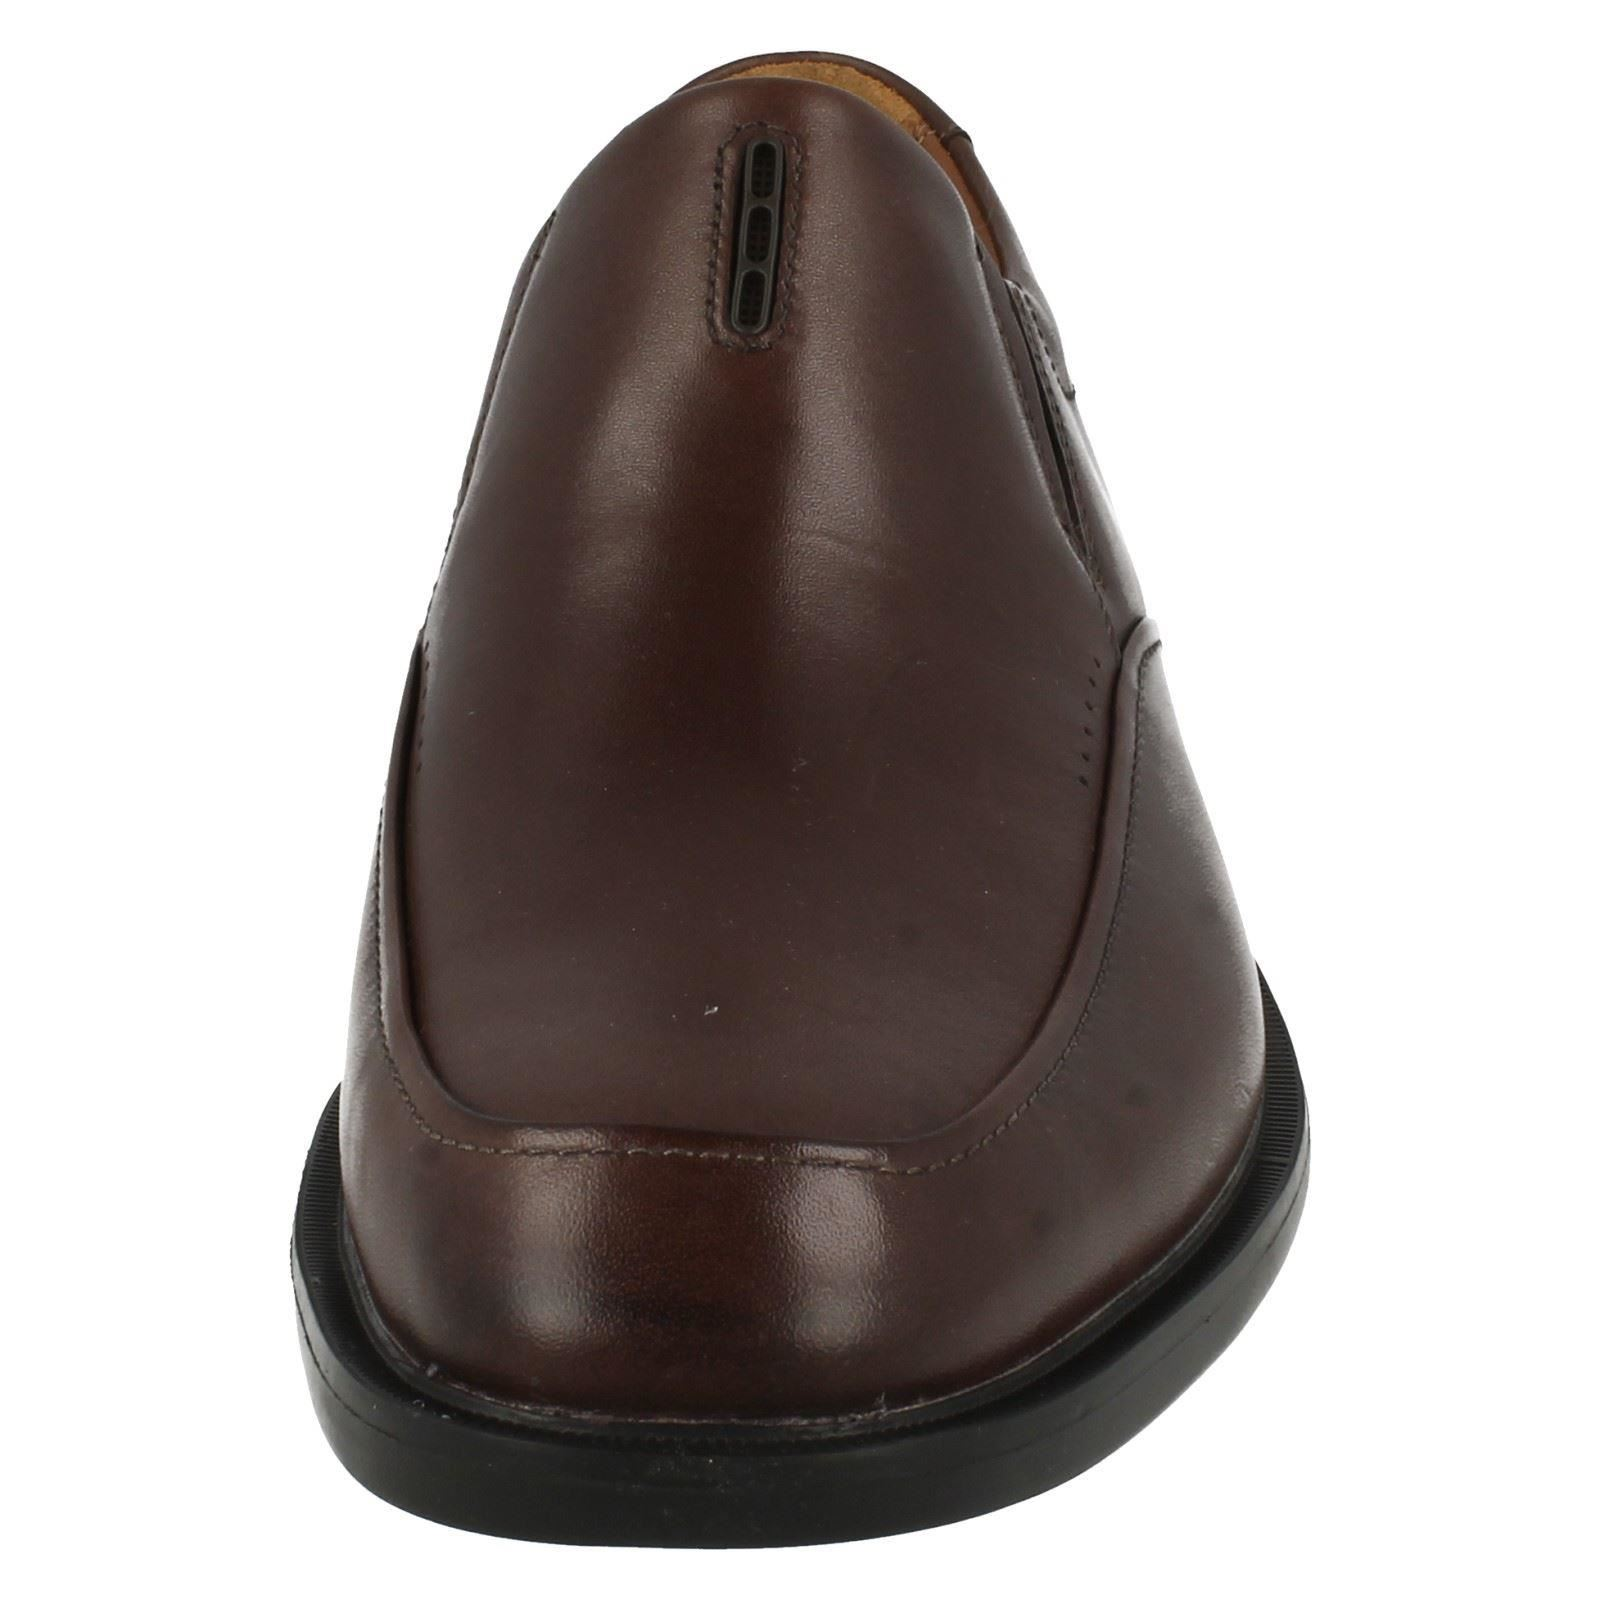 Men's Clarks Unstructured Formal Slip On Shoes Label - Unbizley Lane